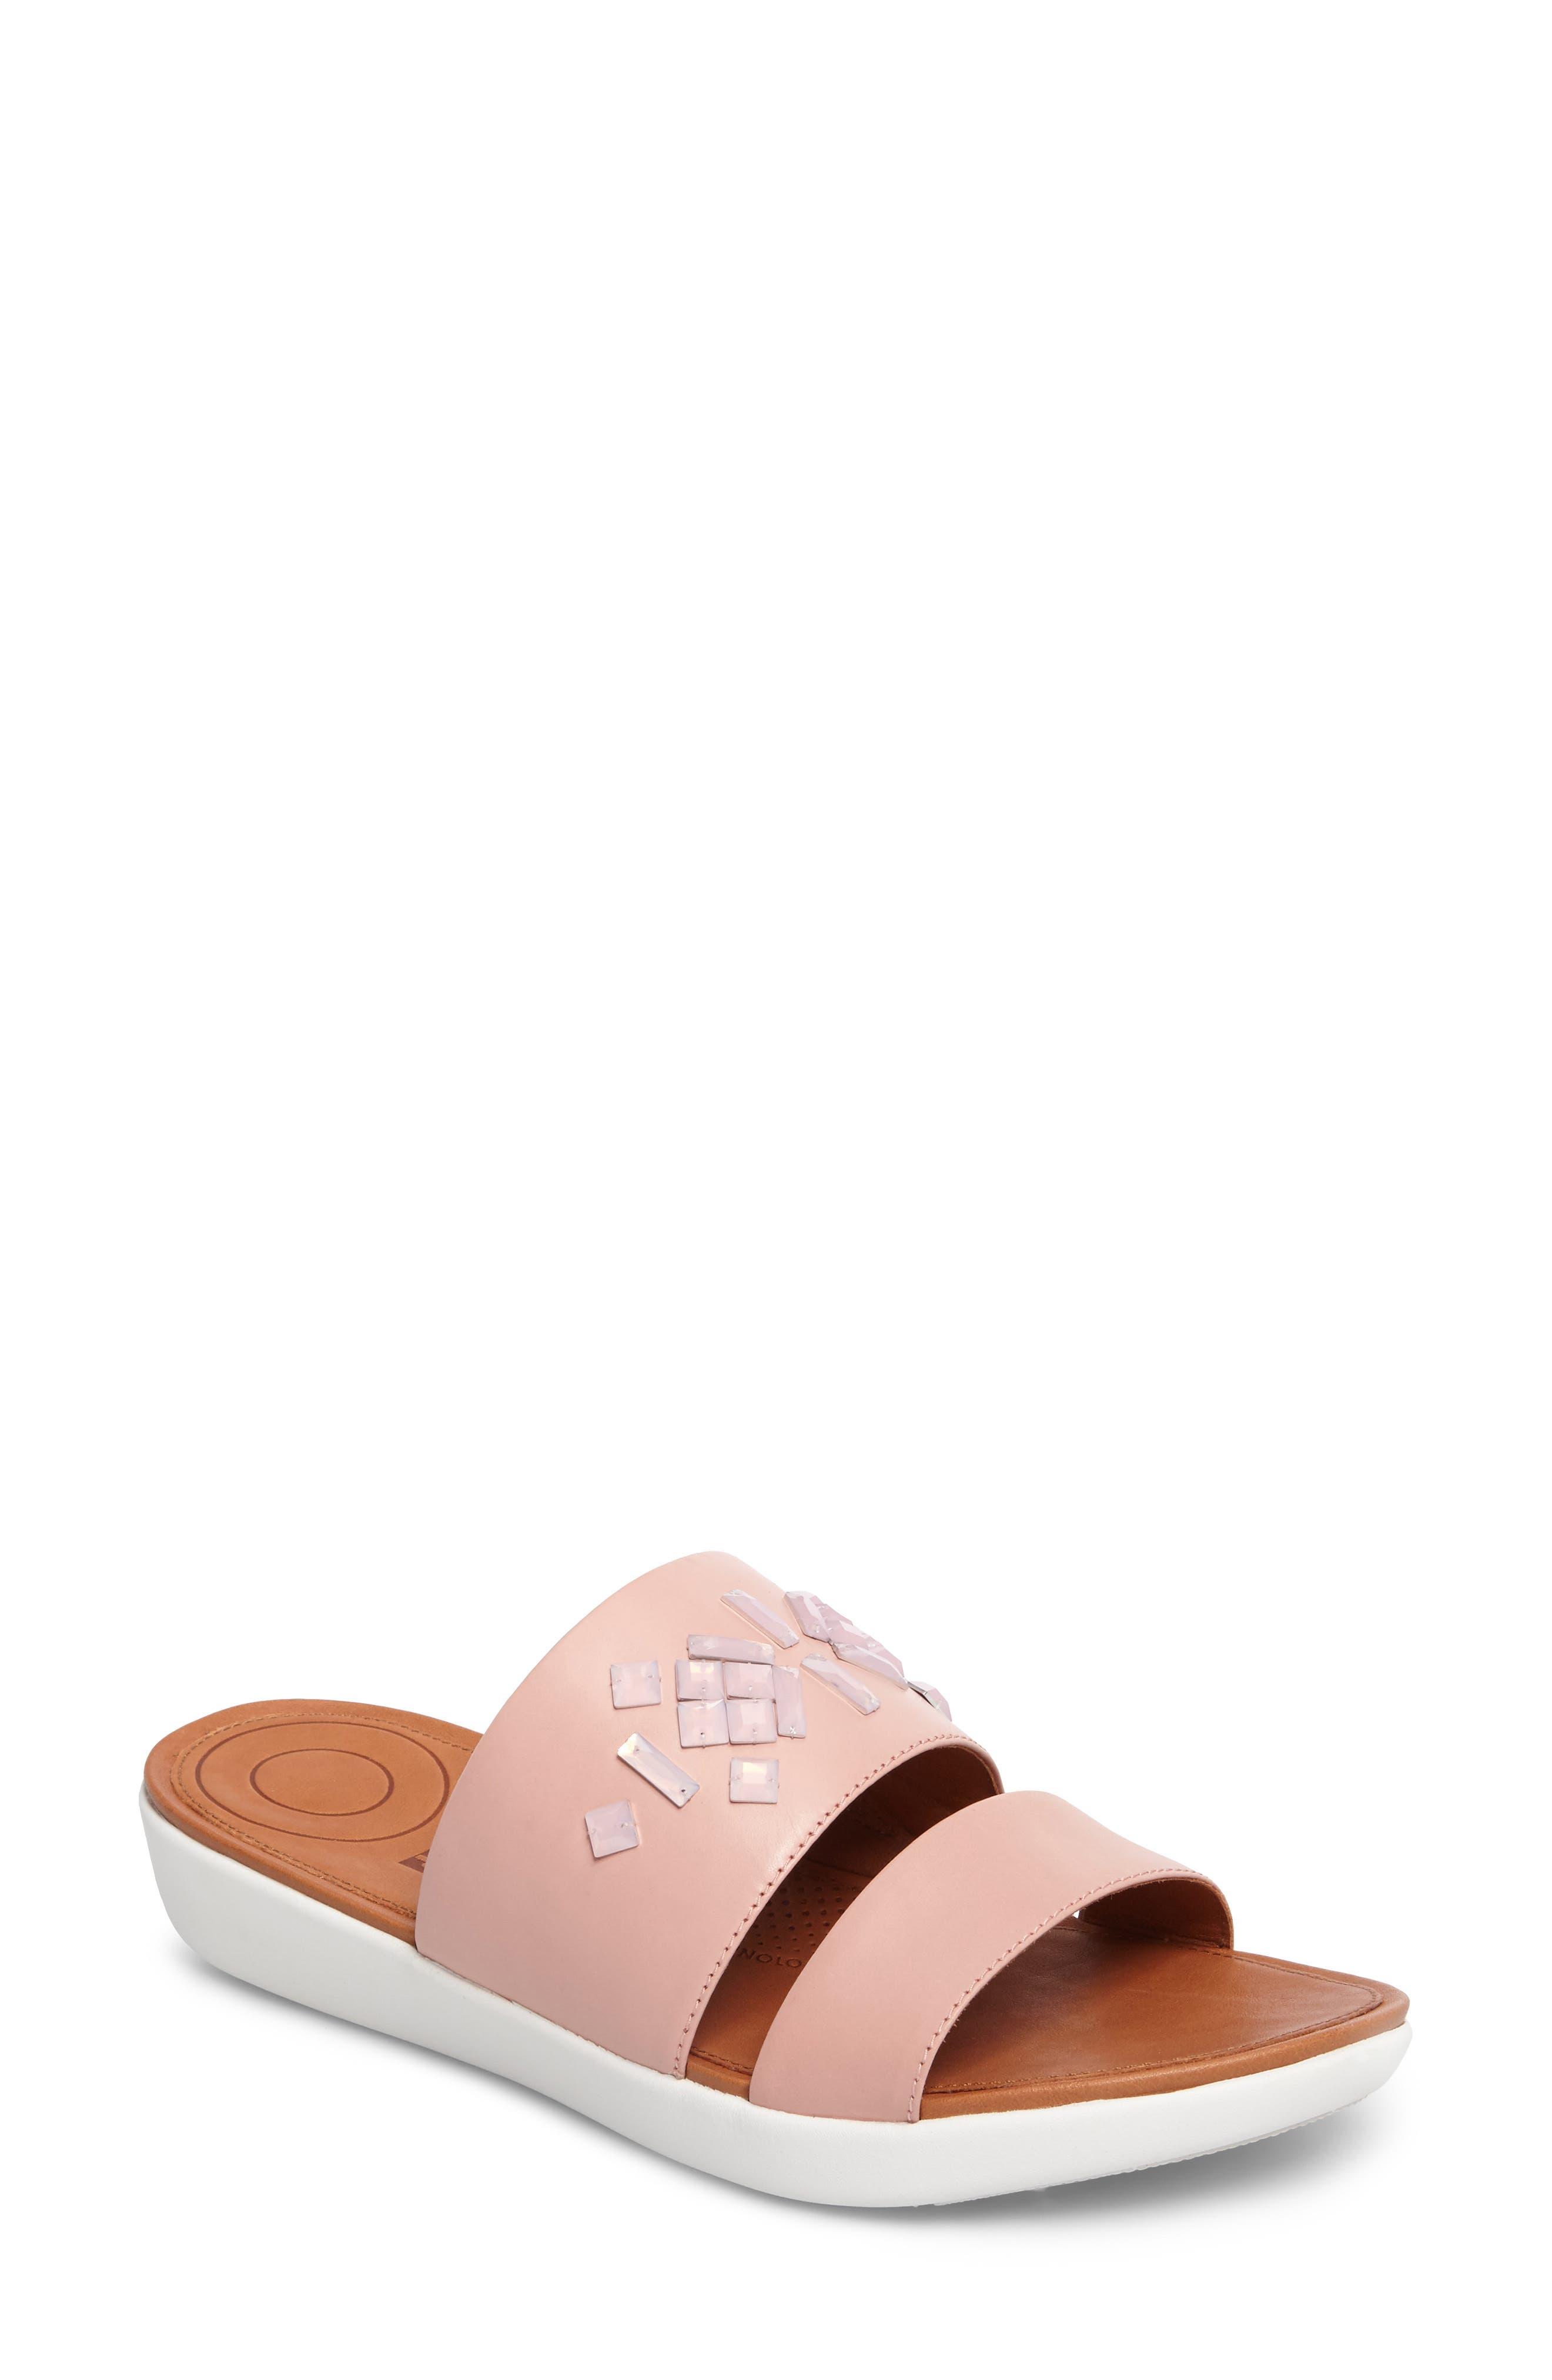 FITFLOP Delta Slide Sandal, Main, color, DUSTY PINK LEATHER